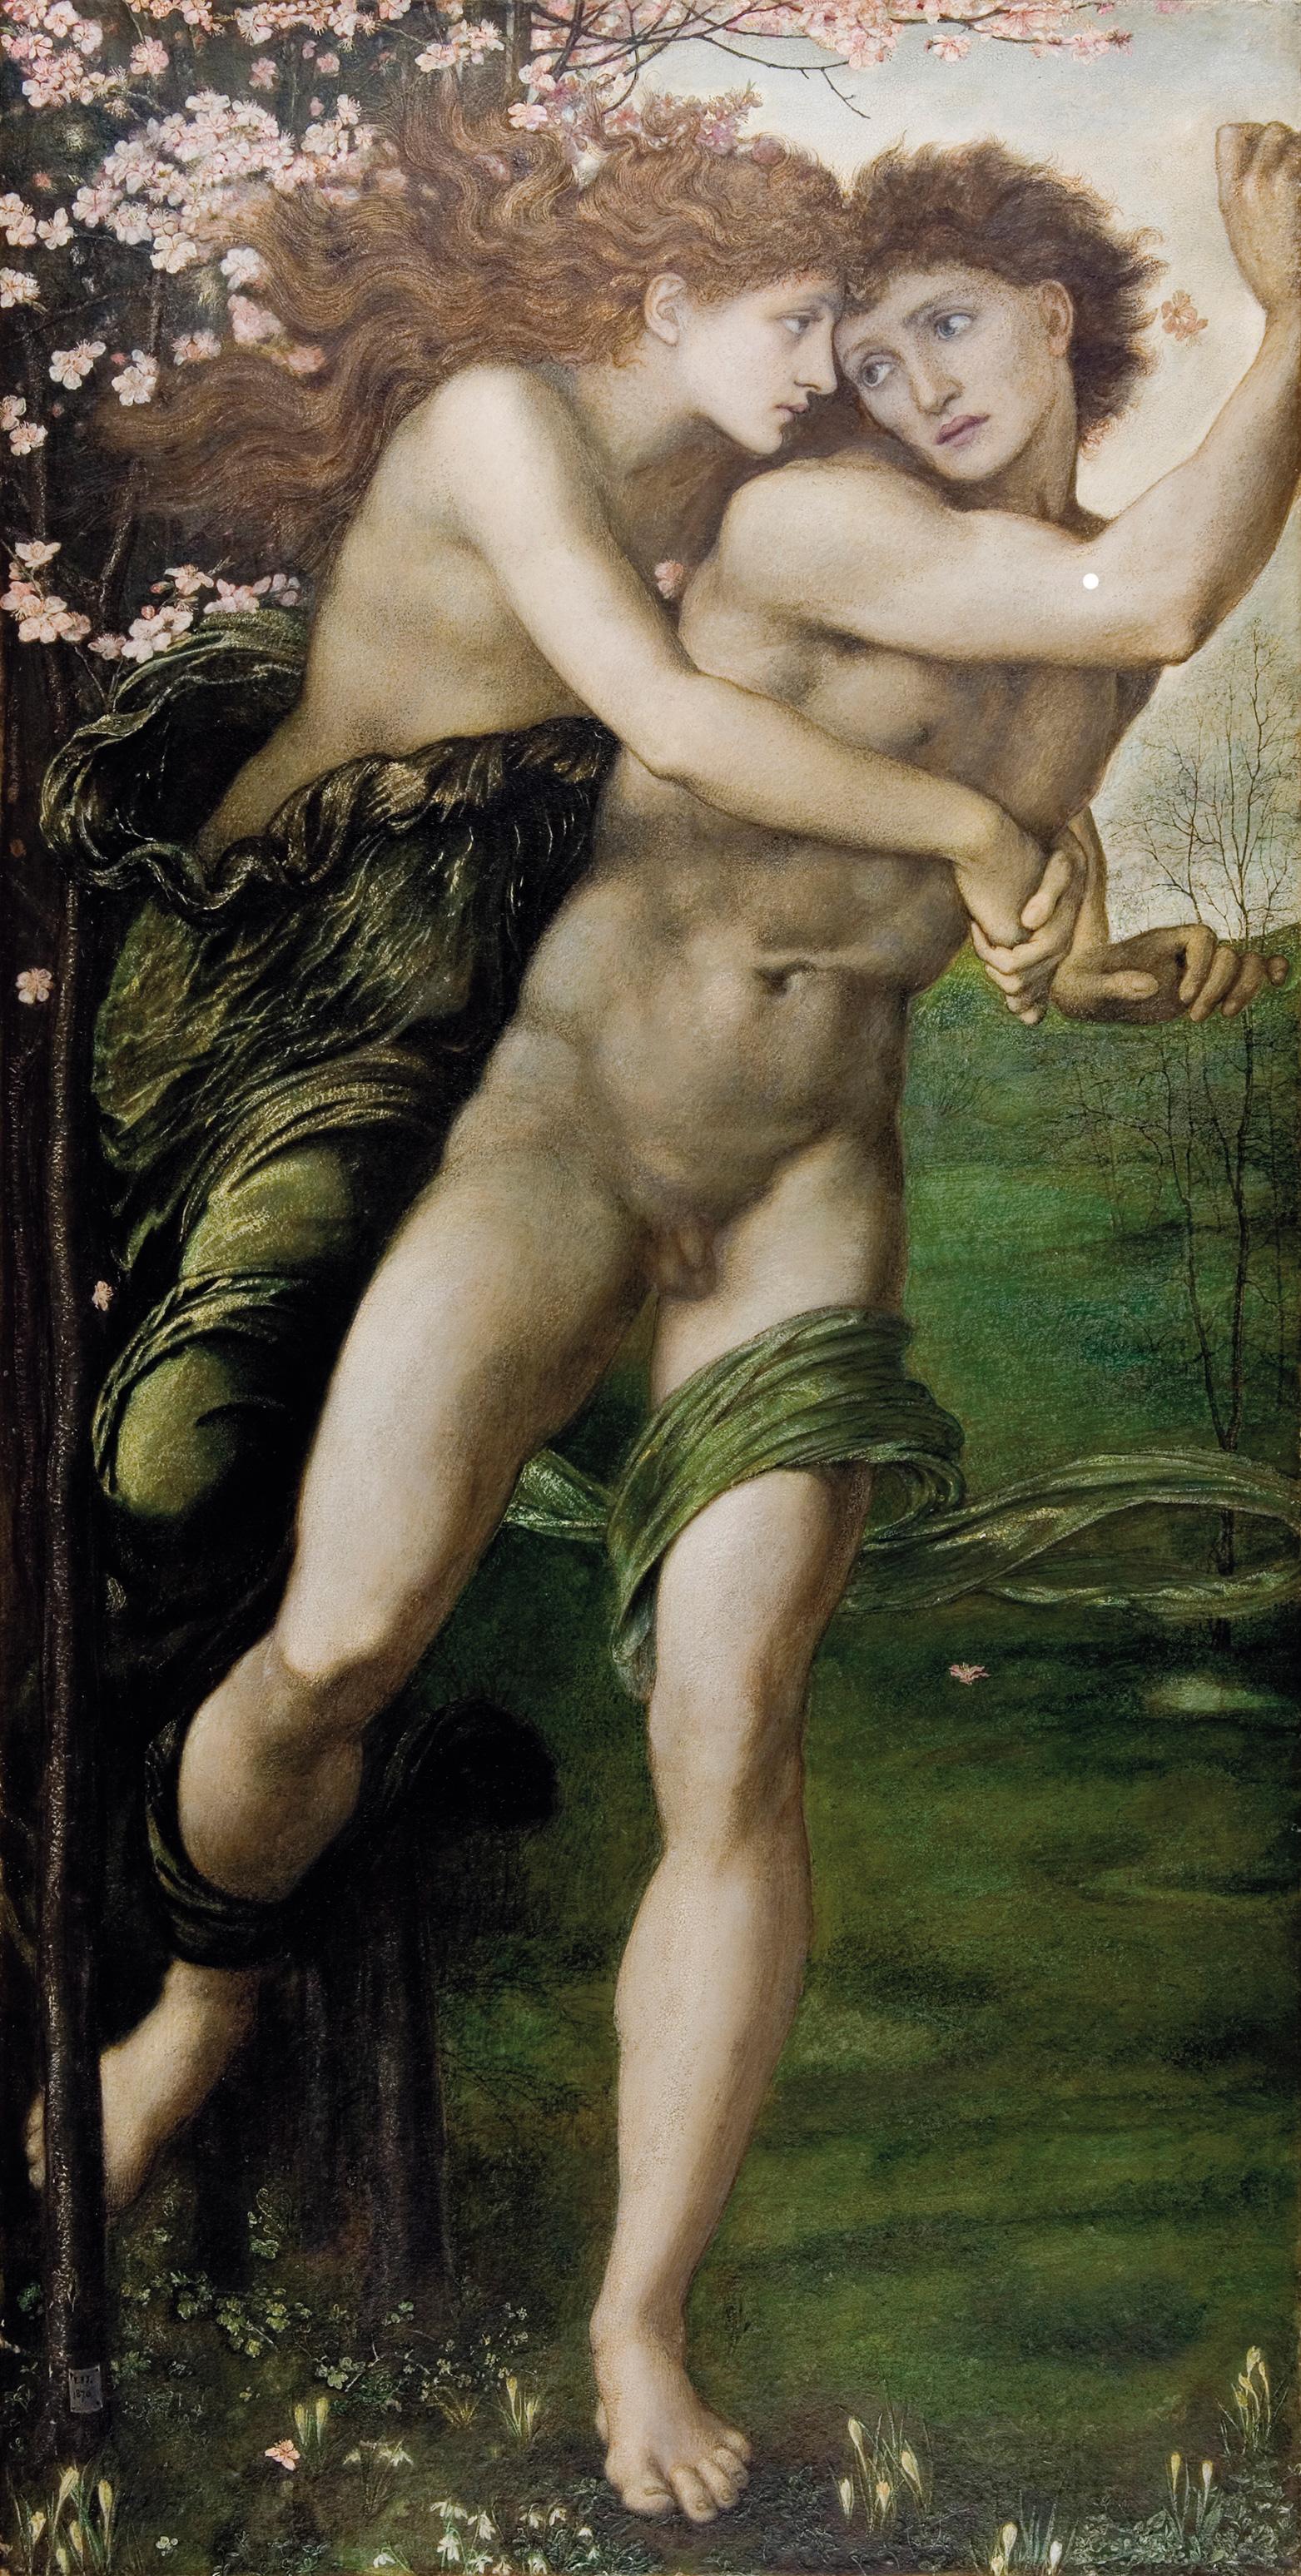 Филлида и Демофонт :: Сэр Эдвард Бёрн-Джонс - Edward Coley Burne-Jones фото